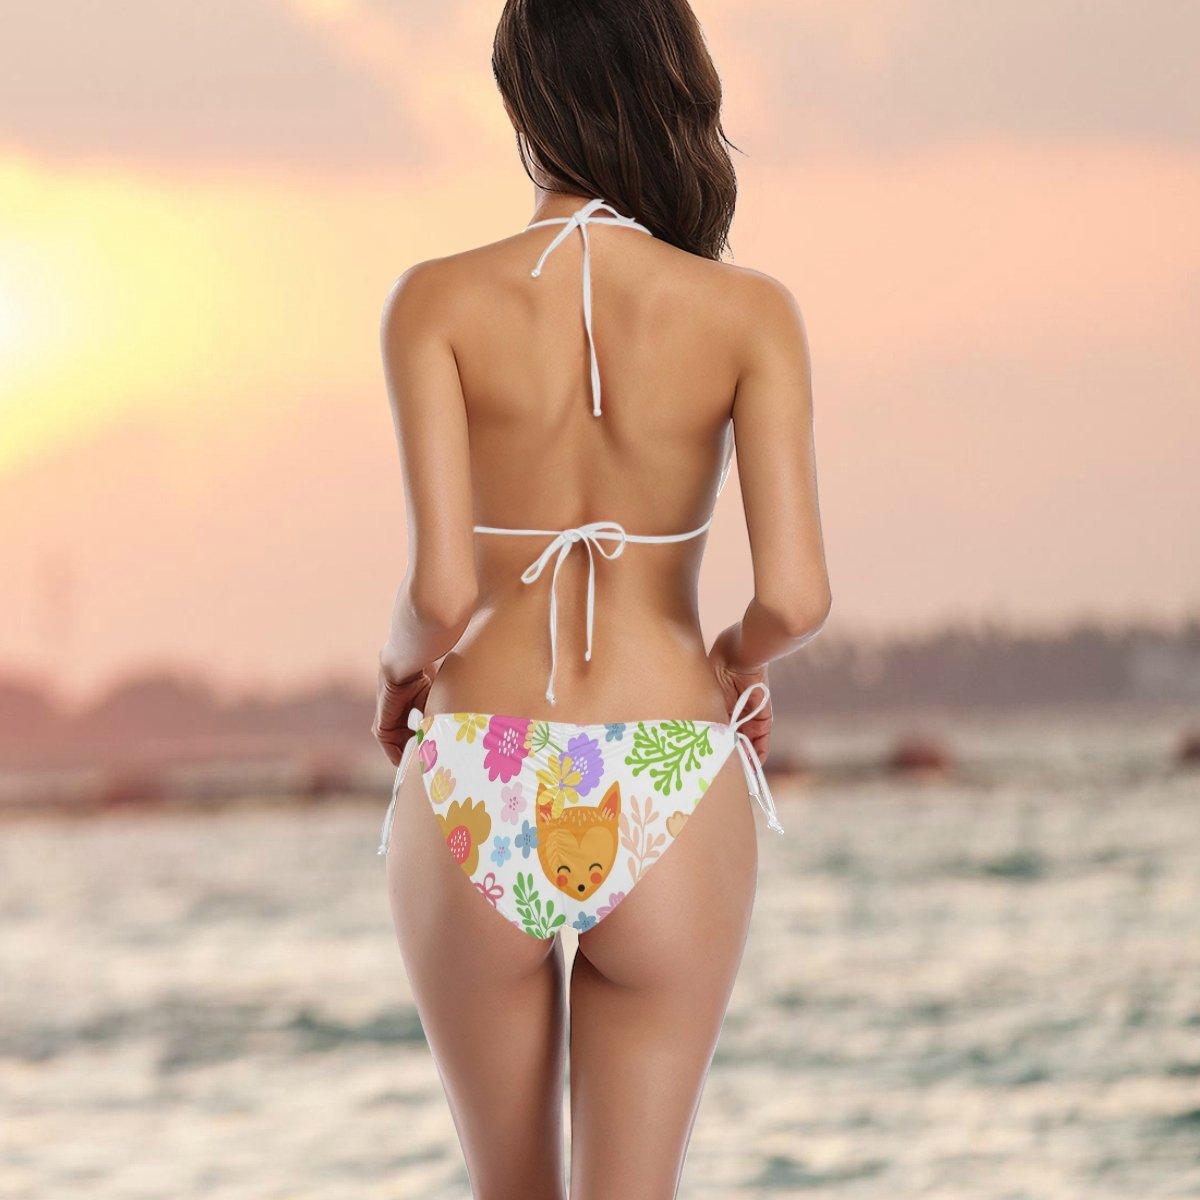 77b3901f165 Amazon.com  U LIFE Cute Rabbit Fox Bear Bikini Bra Sets Women Swimsuit  Swimwear Beachwear  Clothing